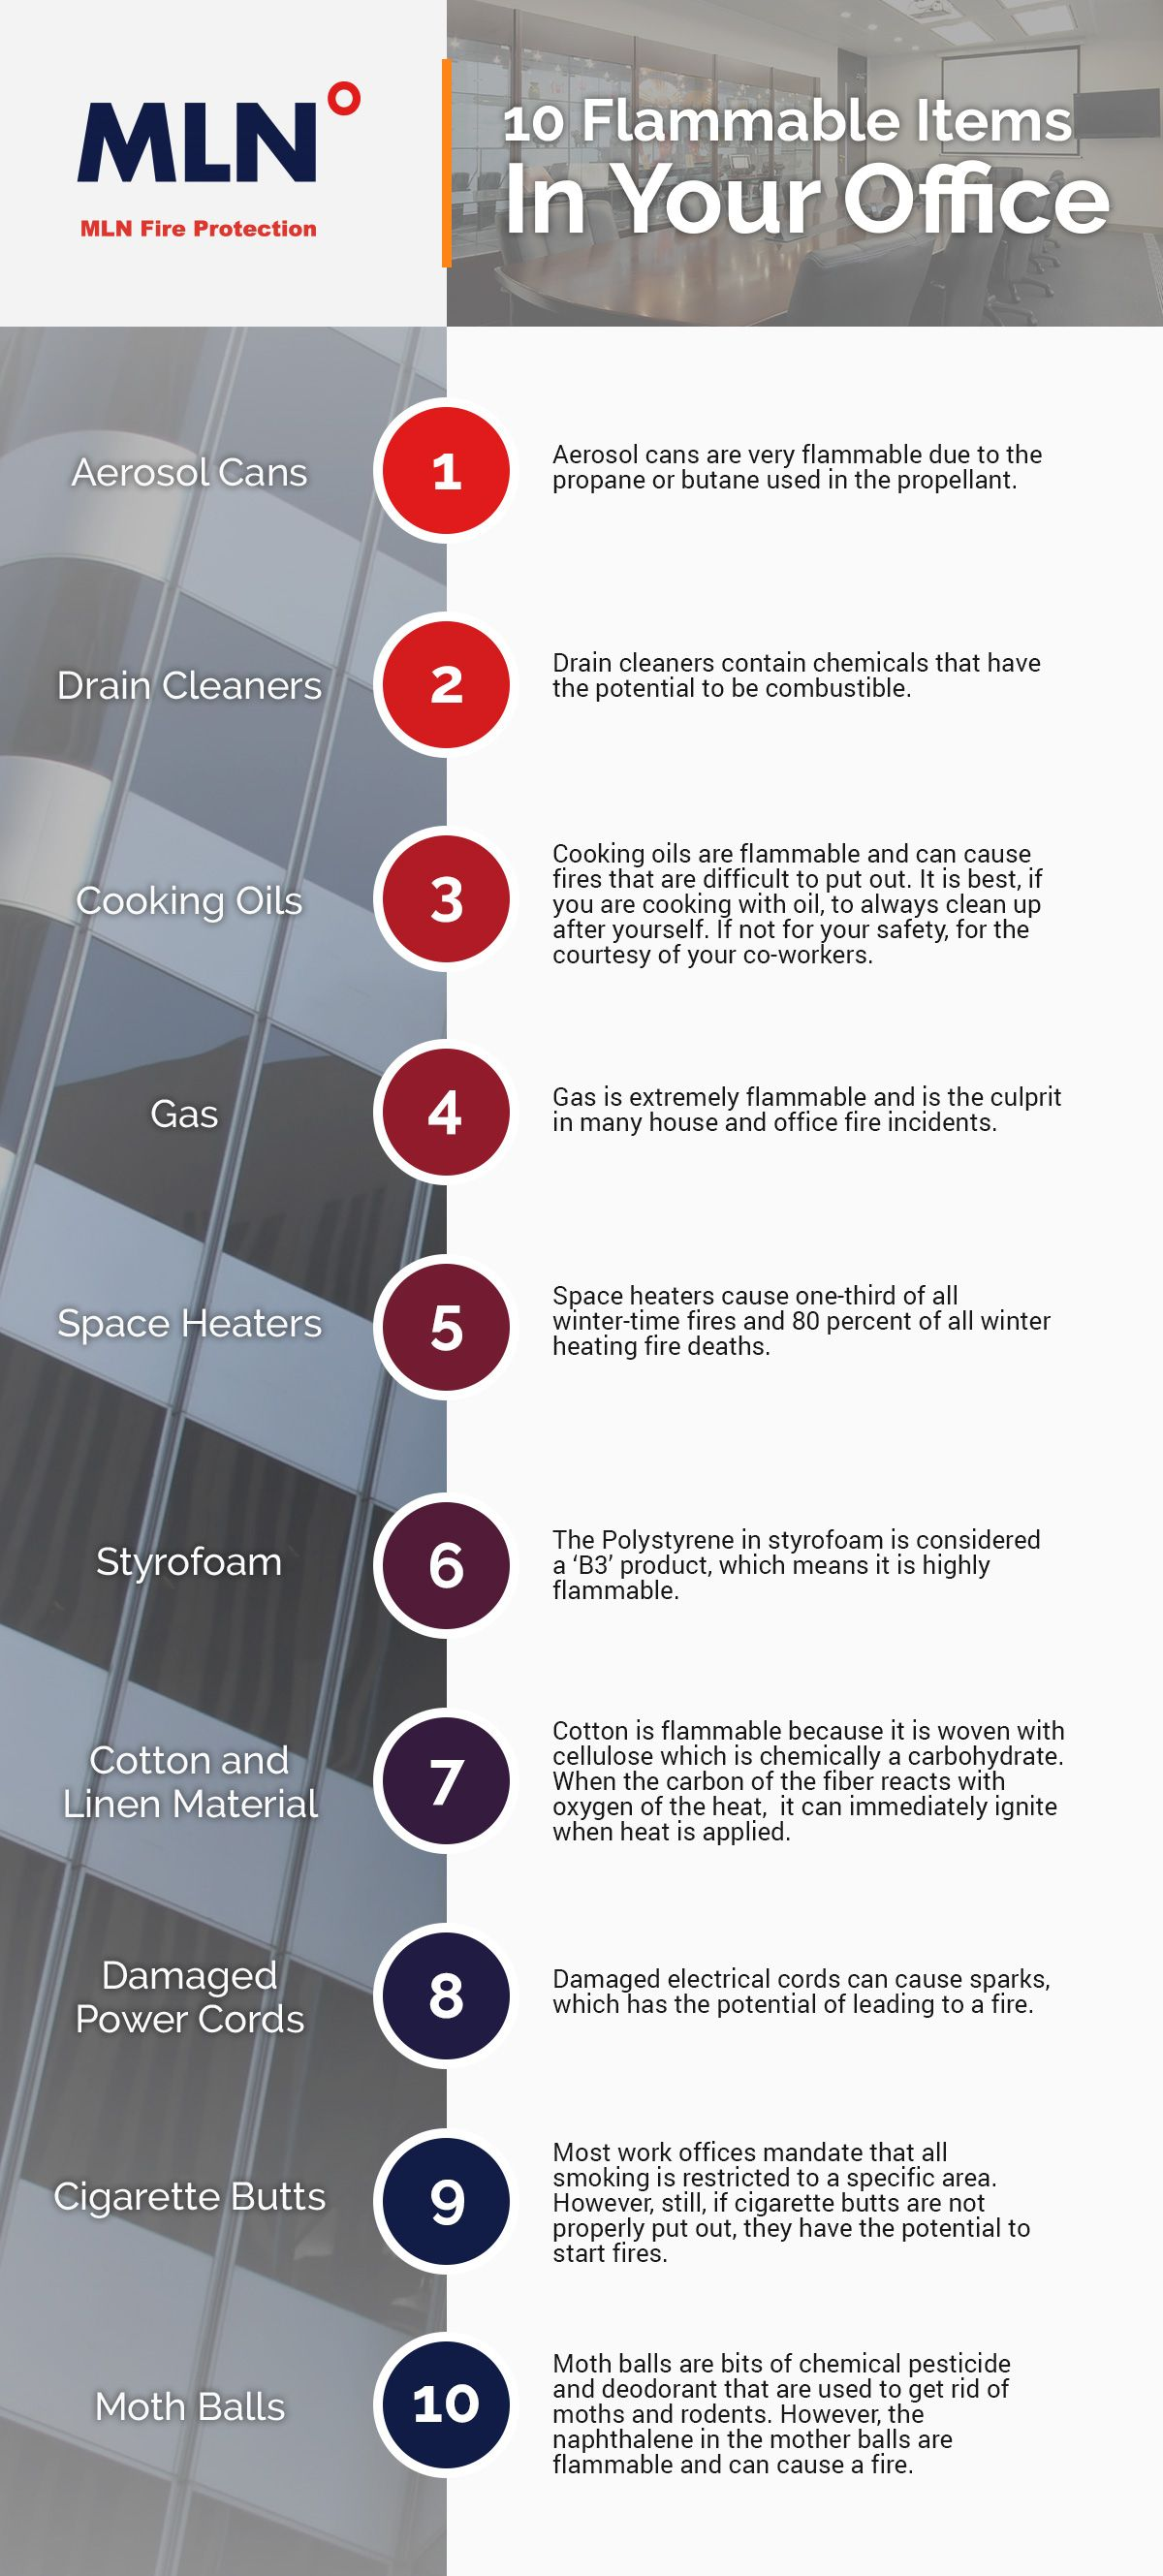 FlamableObjects-Infographic-5b9bdd3ef1820.jpg